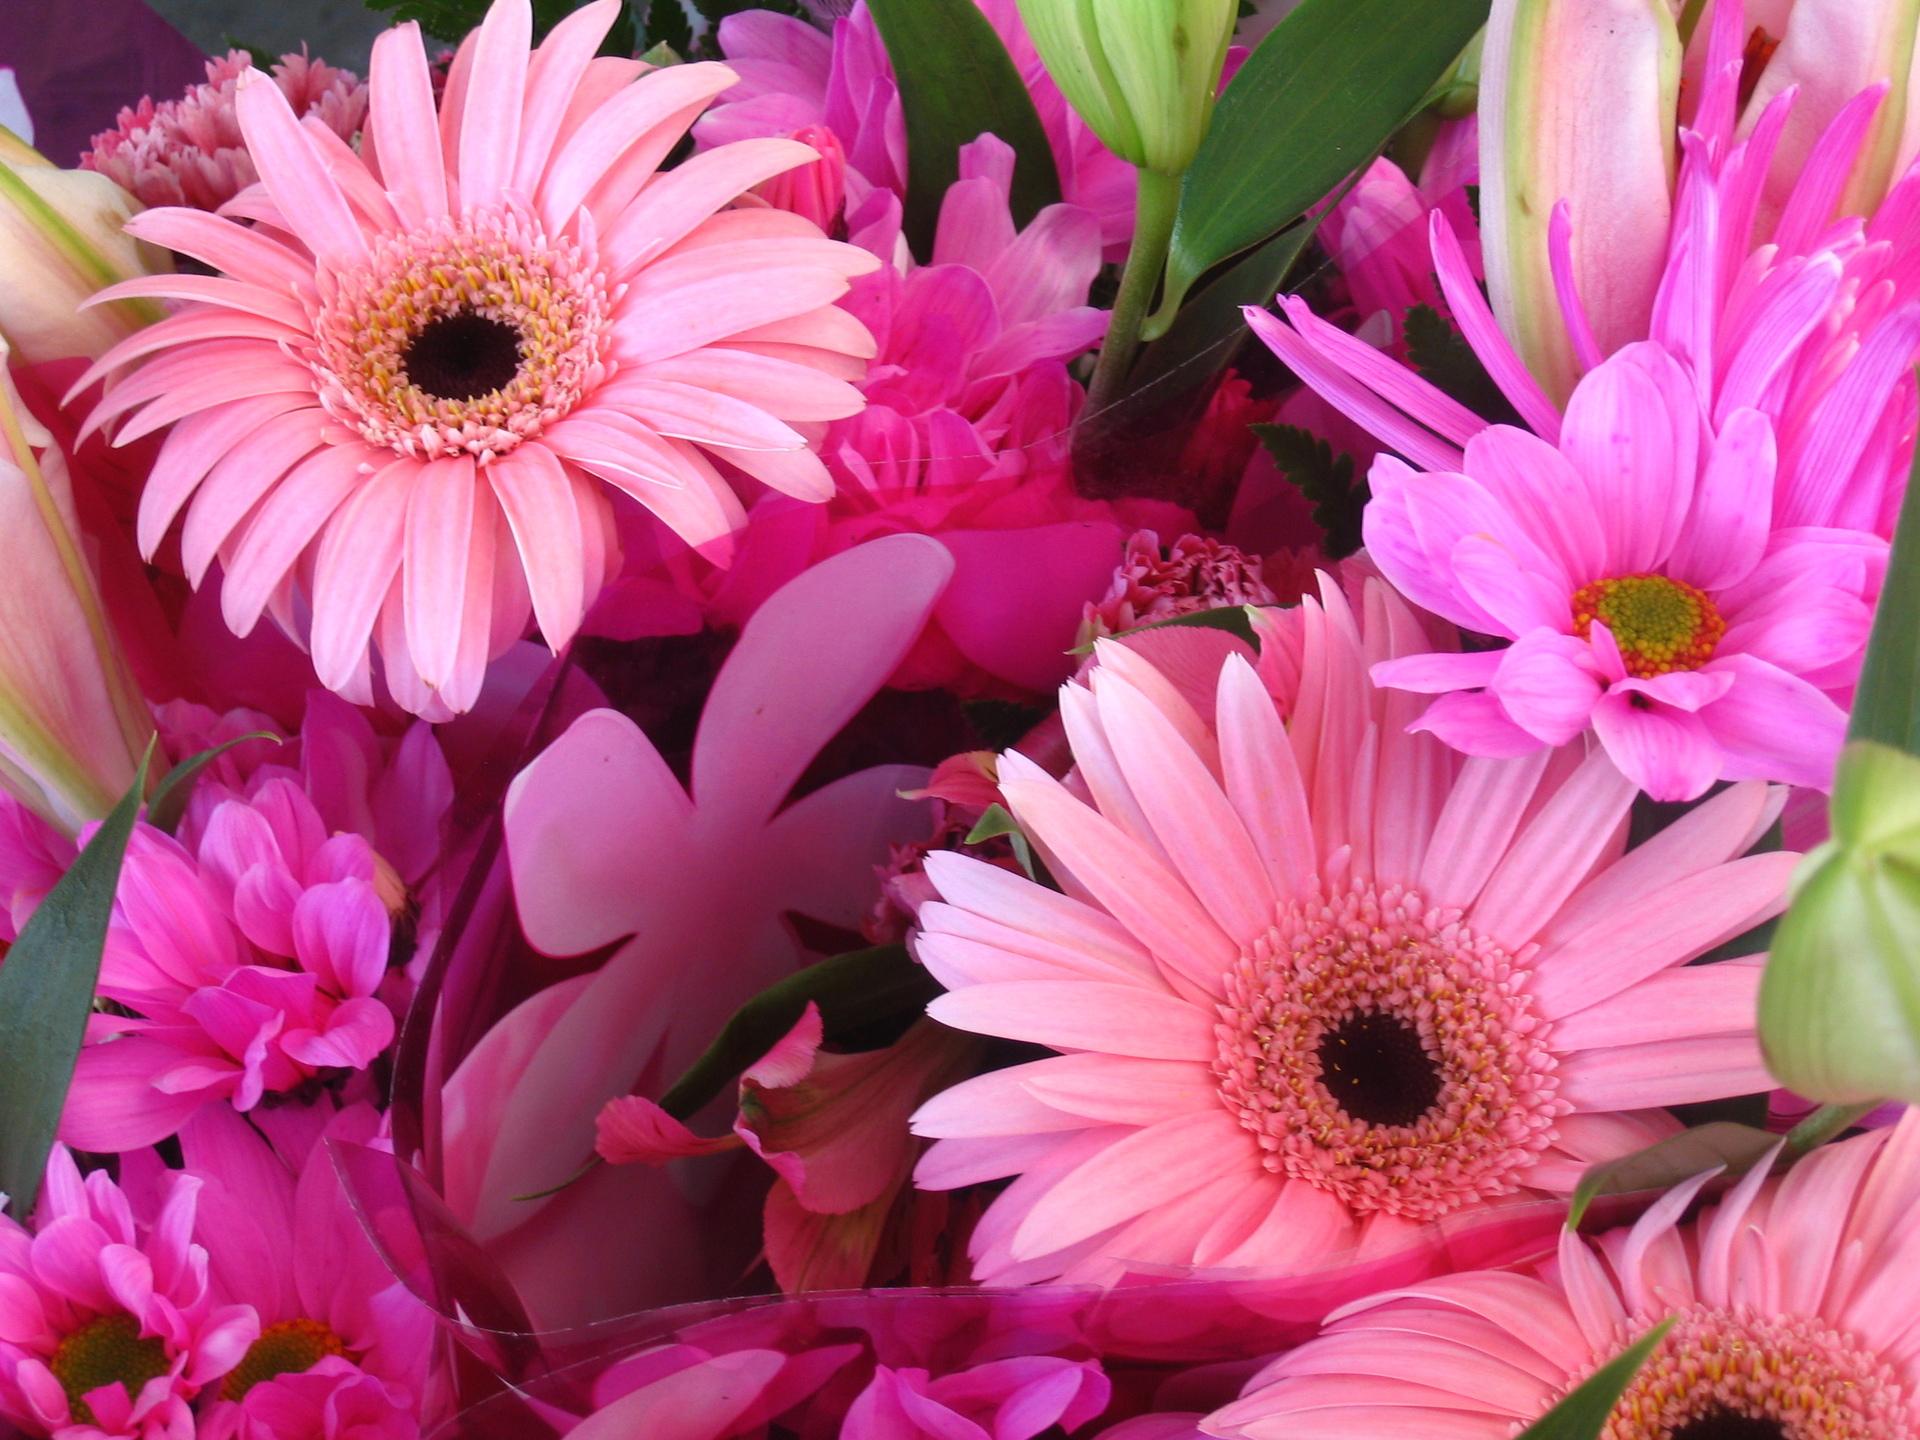 Should you send fresh flowers or silk flowers?